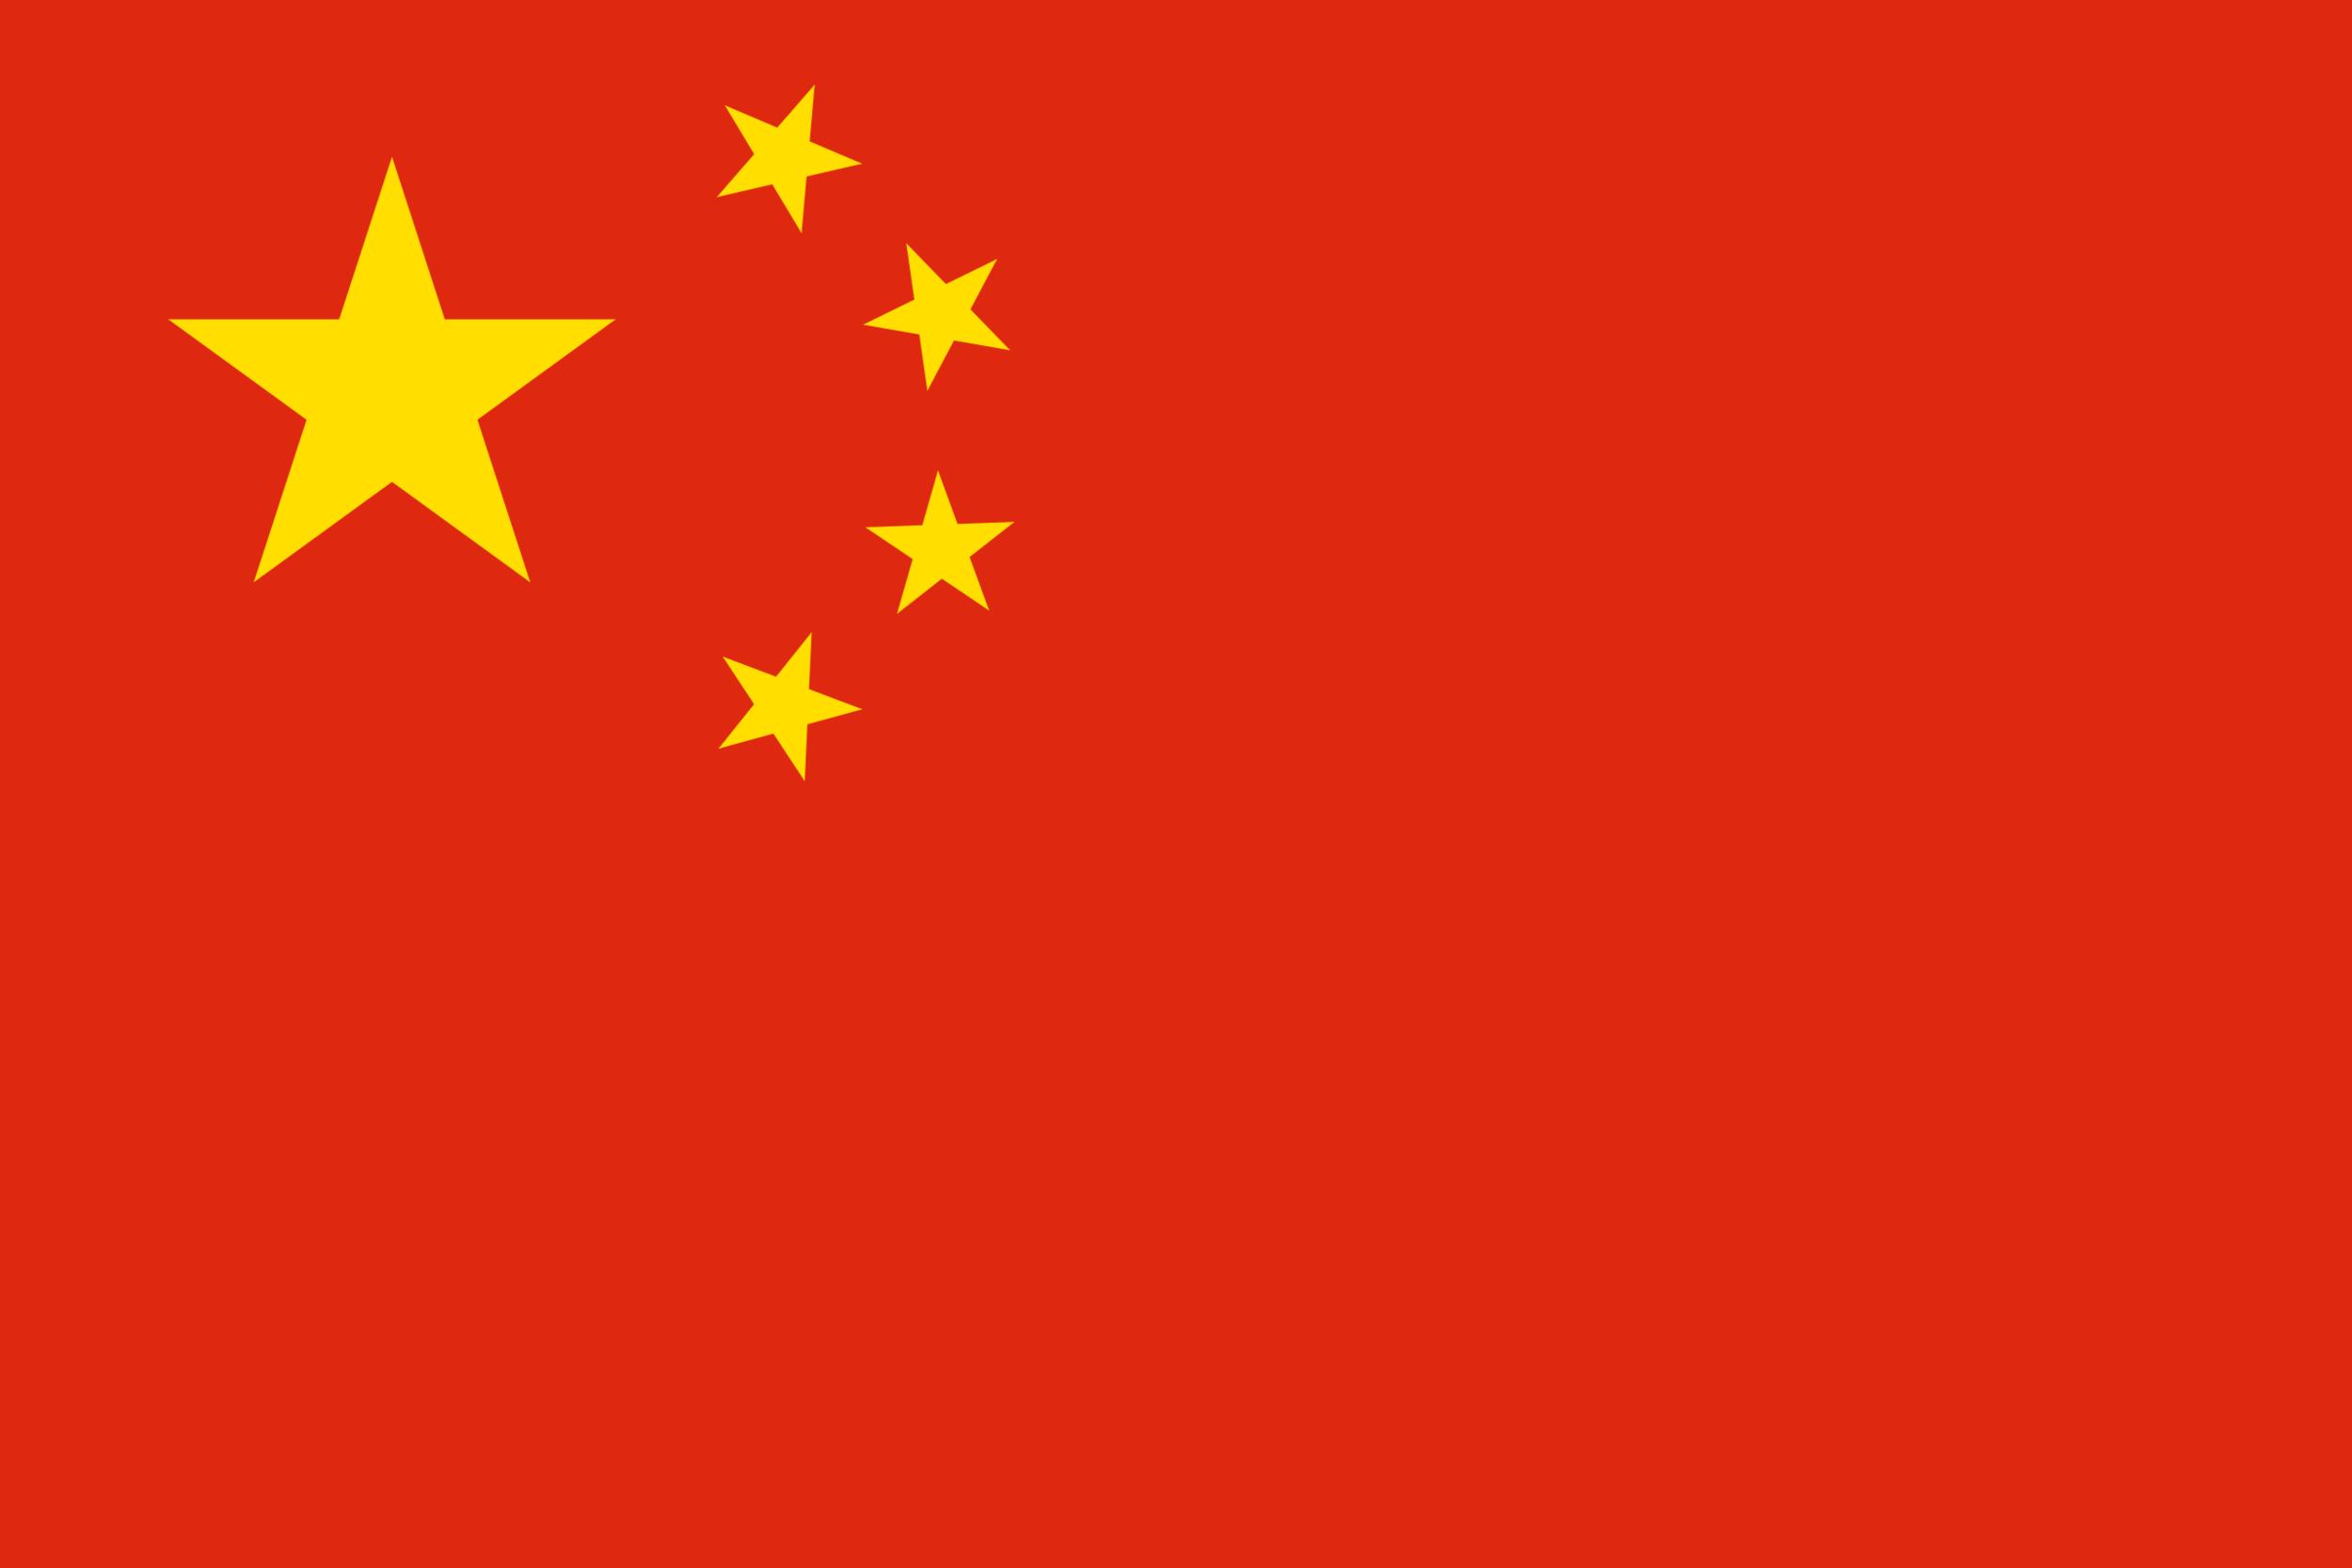 ChinaFlag.png